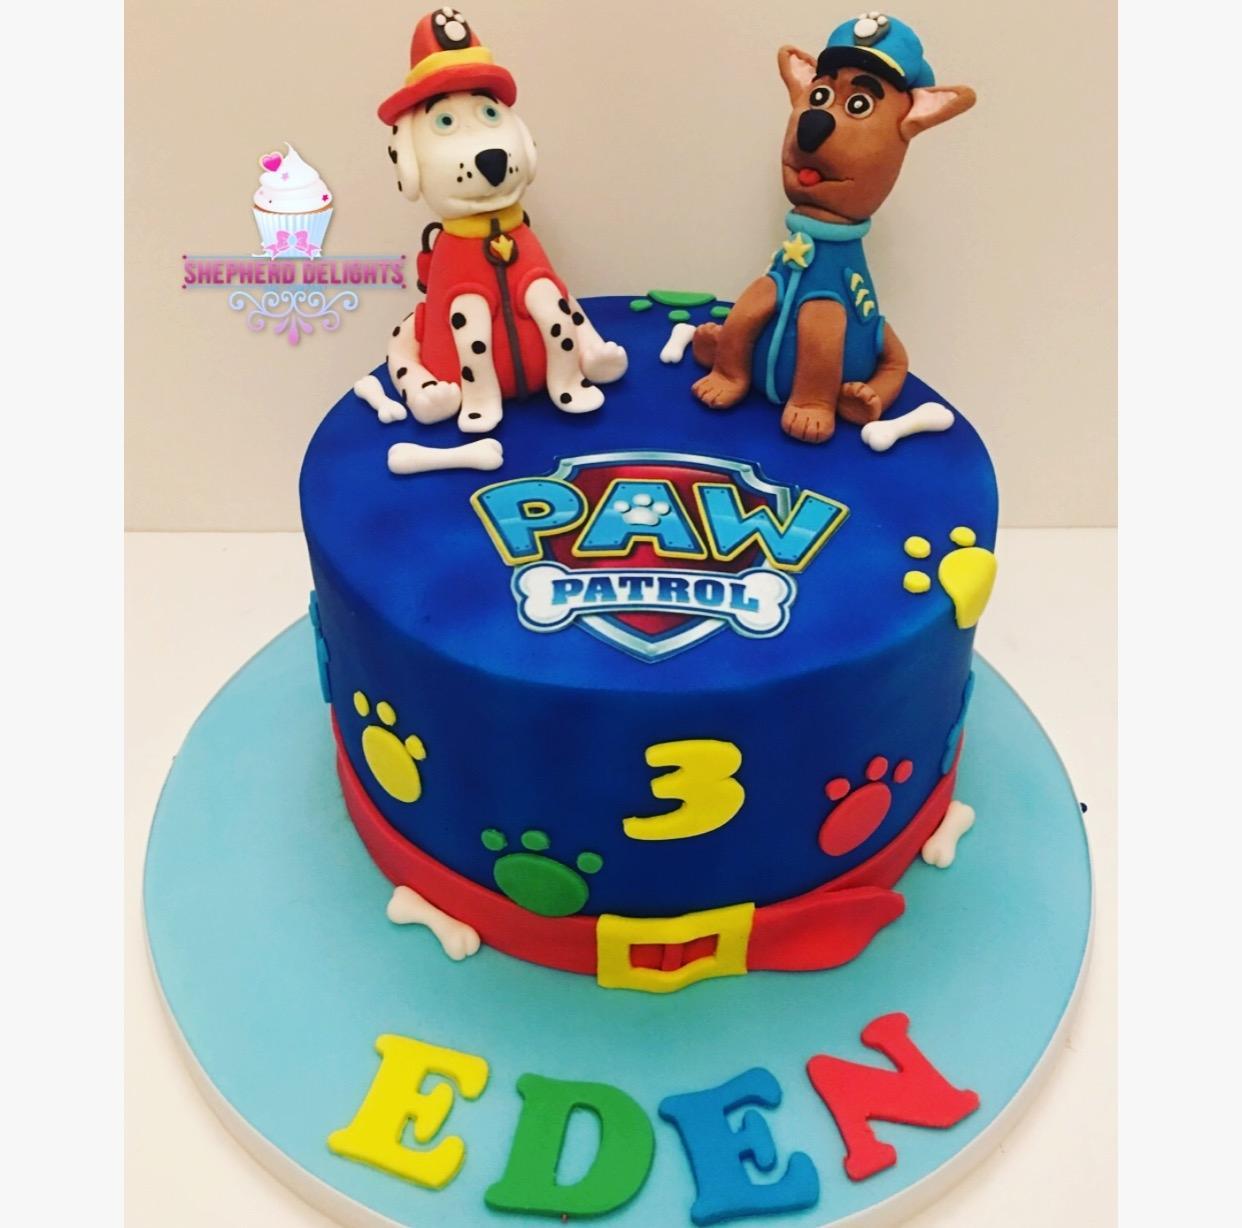 paw patrol birthday cake » birthday cakes » cakes for children